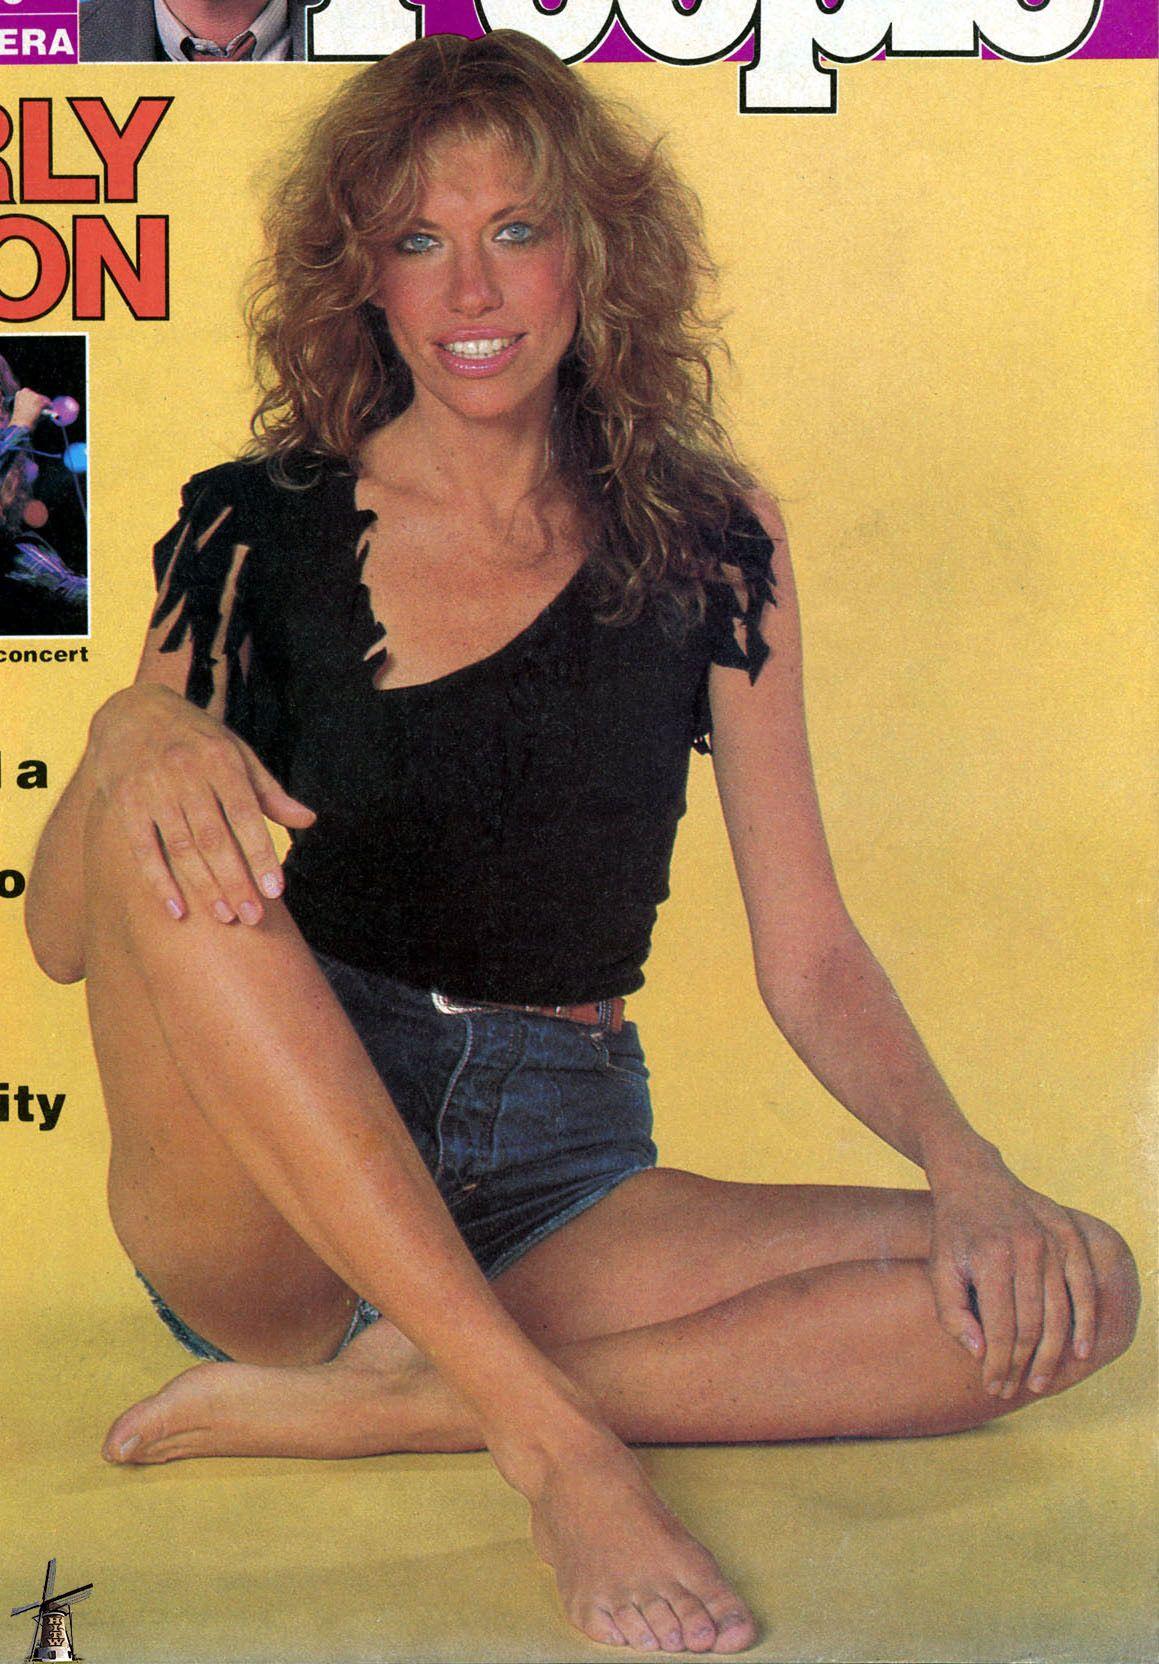 Carly Simon Carly Simon Carly People Magazine